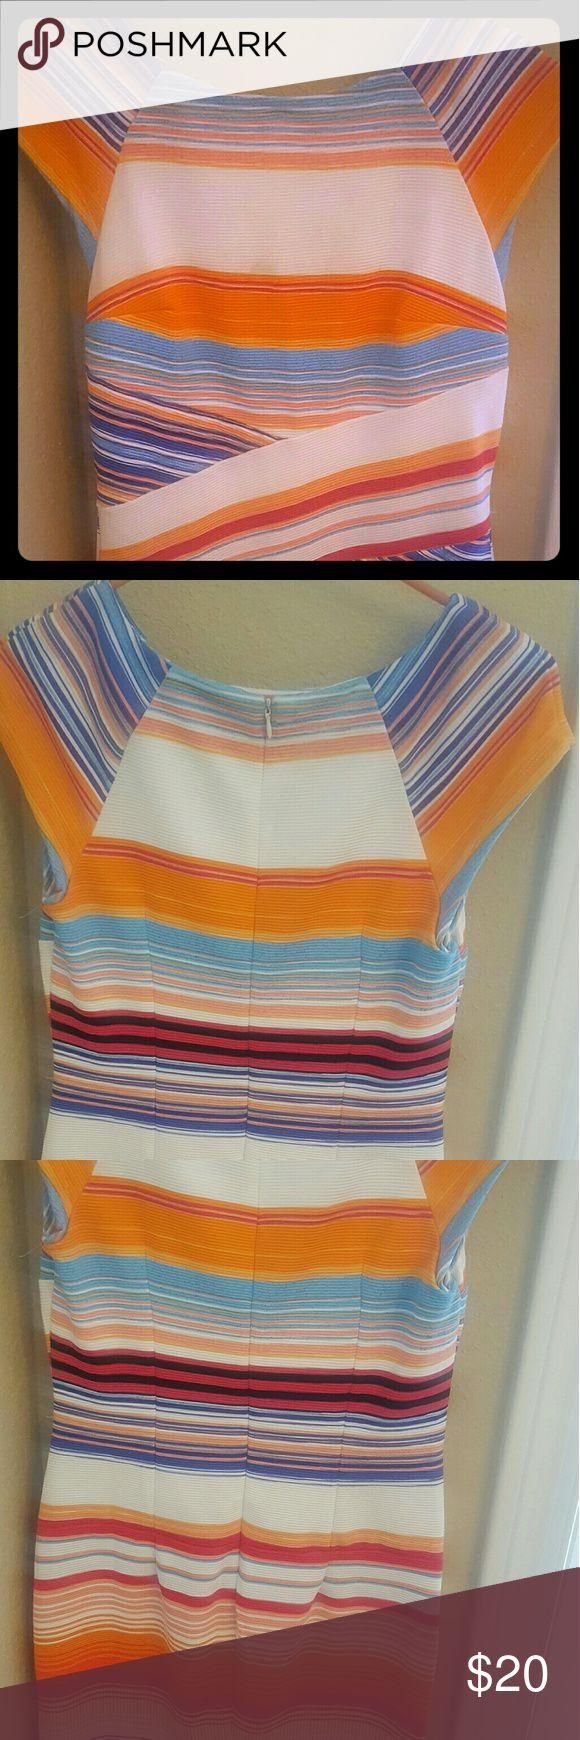 New York and Company Striped Body Con Dress Multi-Colored Striped Body Con Dress size small New Condition New York & Company Dresses Midi